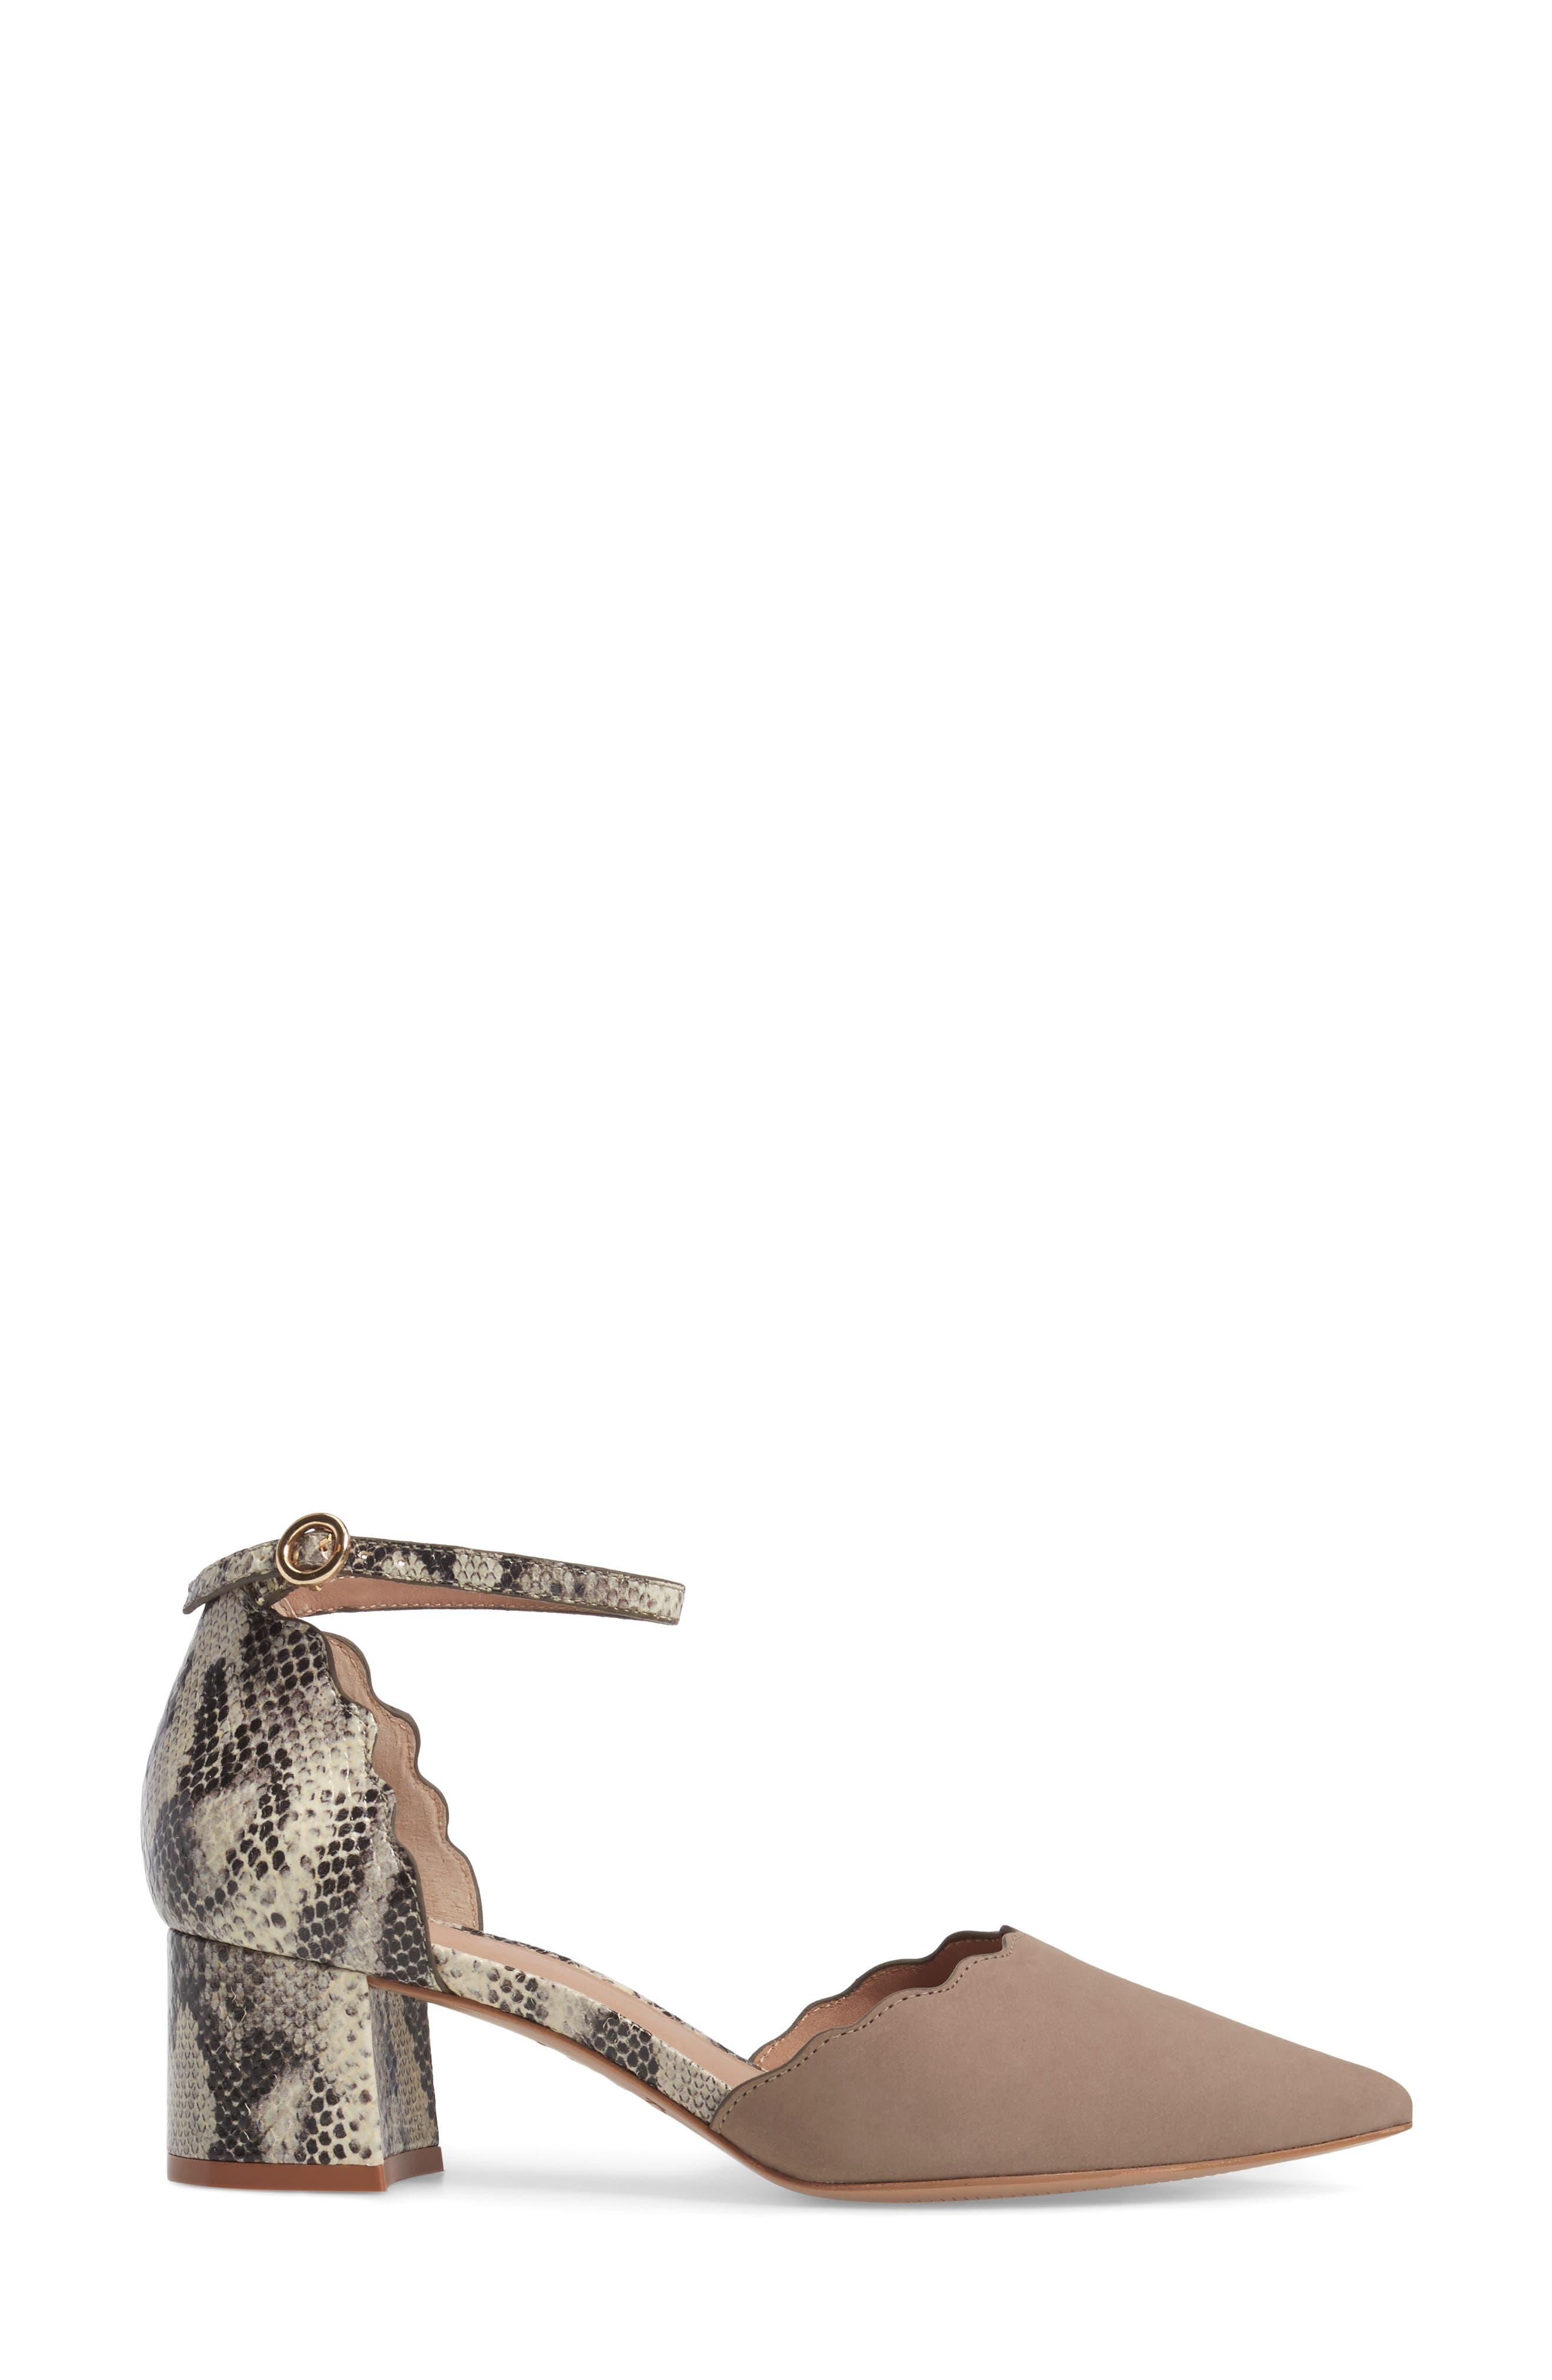 Roseia Pump,                             Alternate thumbnail 3, color,                             Taupe Snake Print